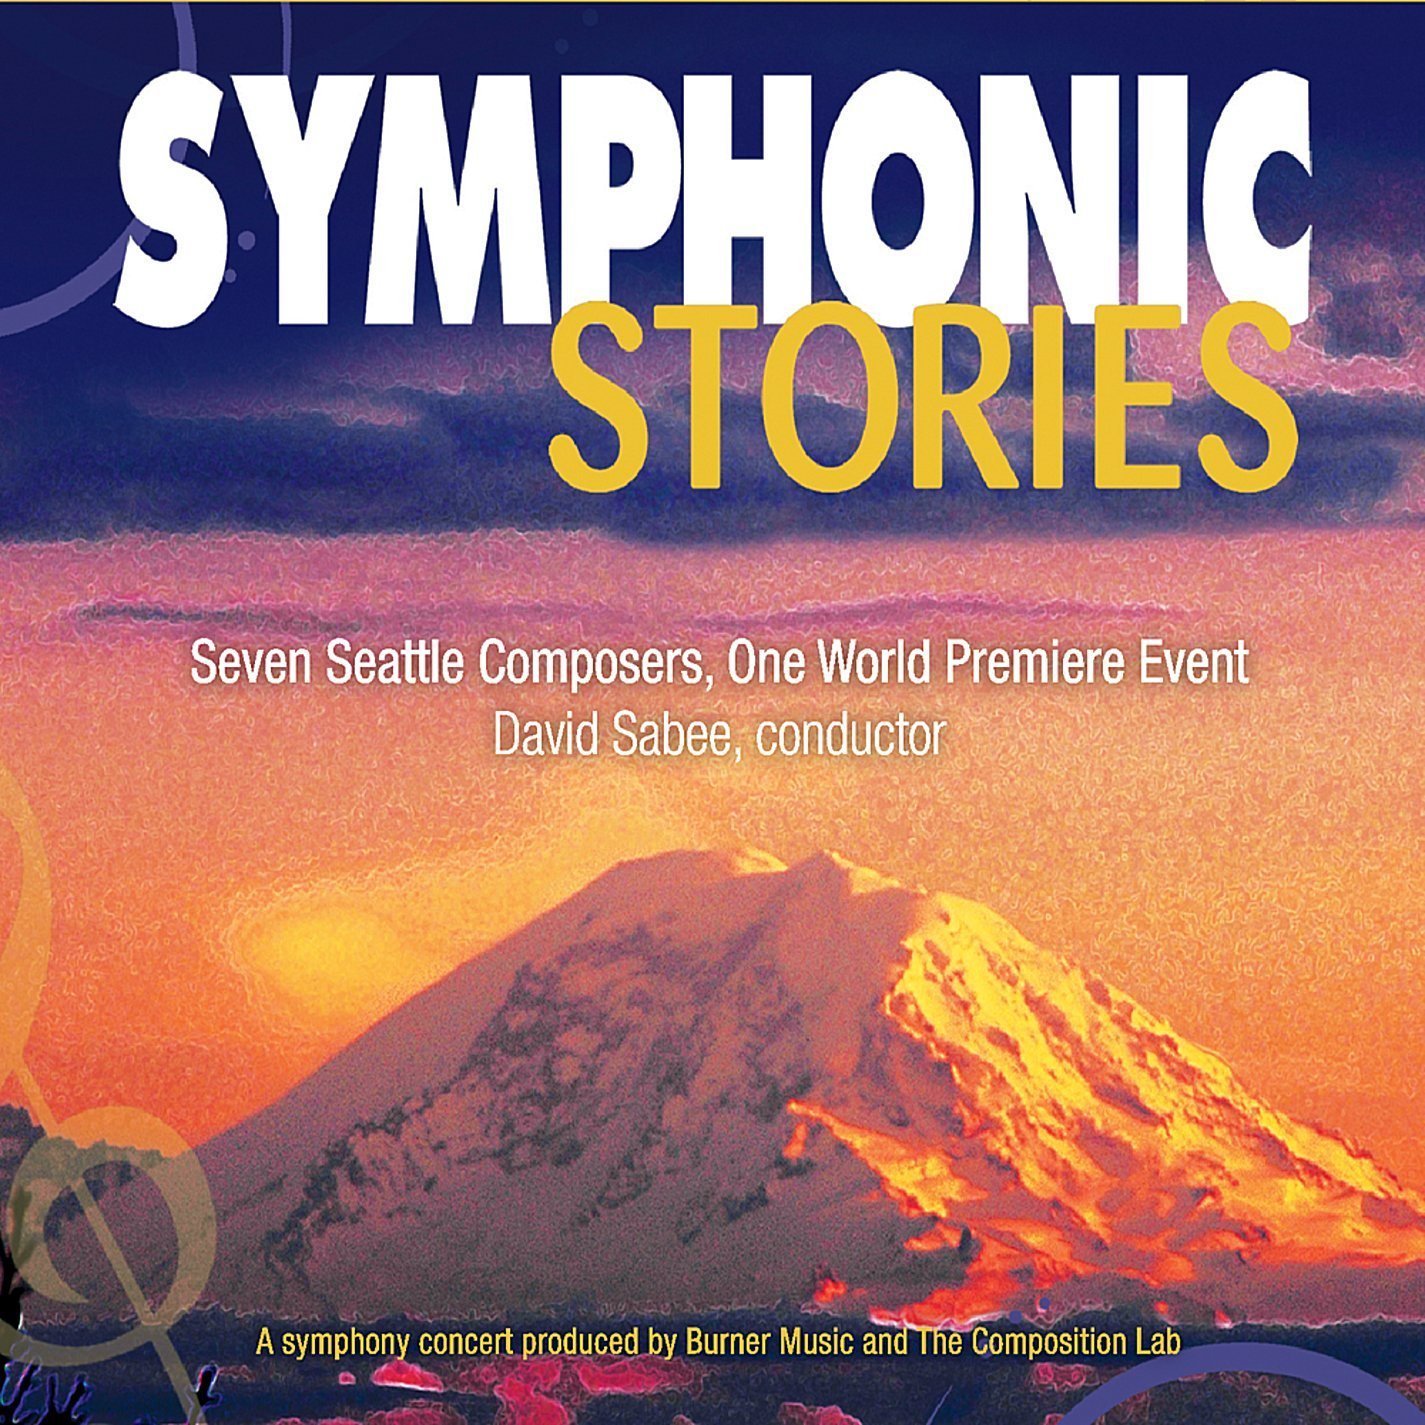 SymphonicStories.jpg